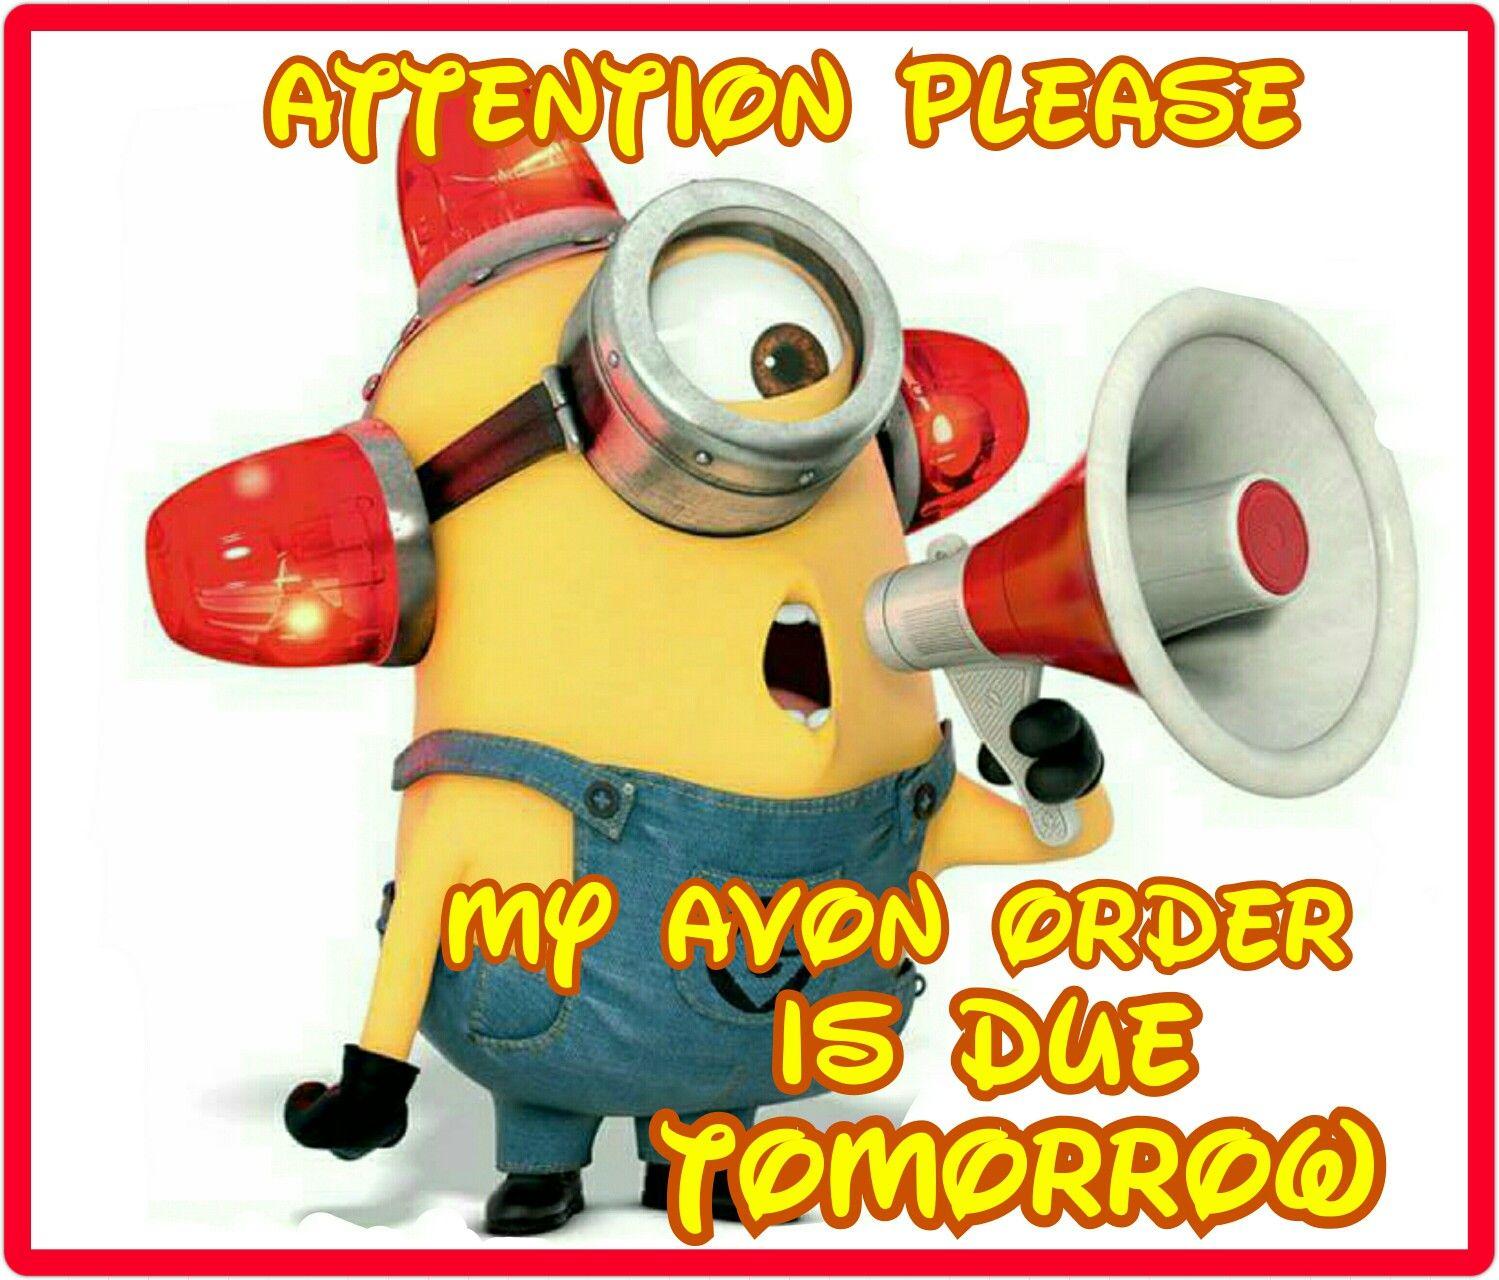 Tomorrow For Sure Meme